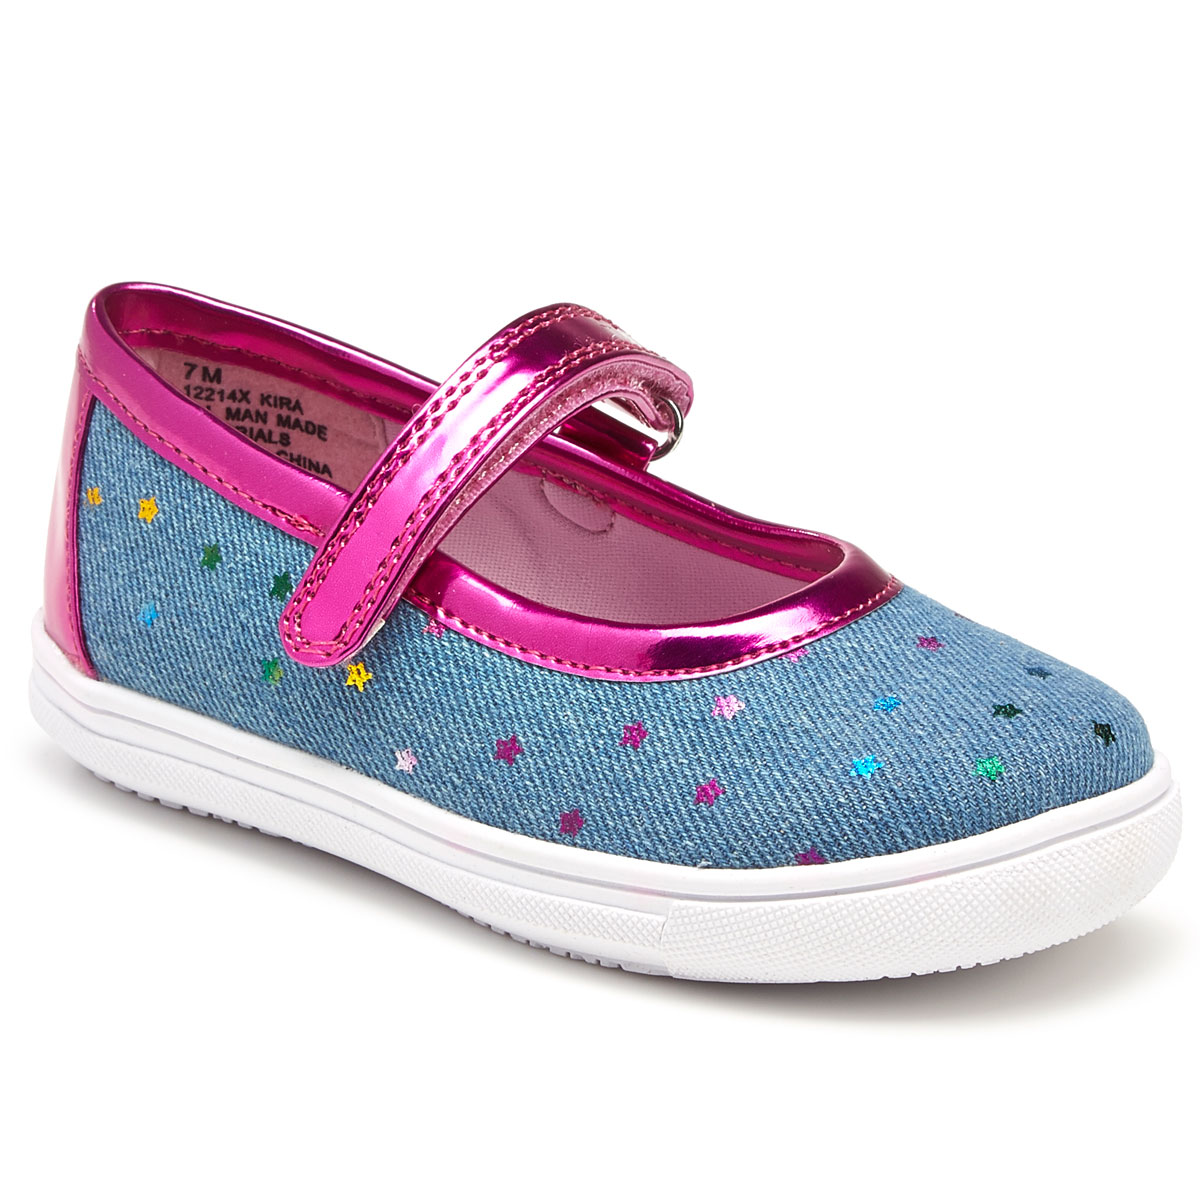 Rachel Shoes Toddler Girls' Kira Stars Mary Jane Flats - Blue, 7